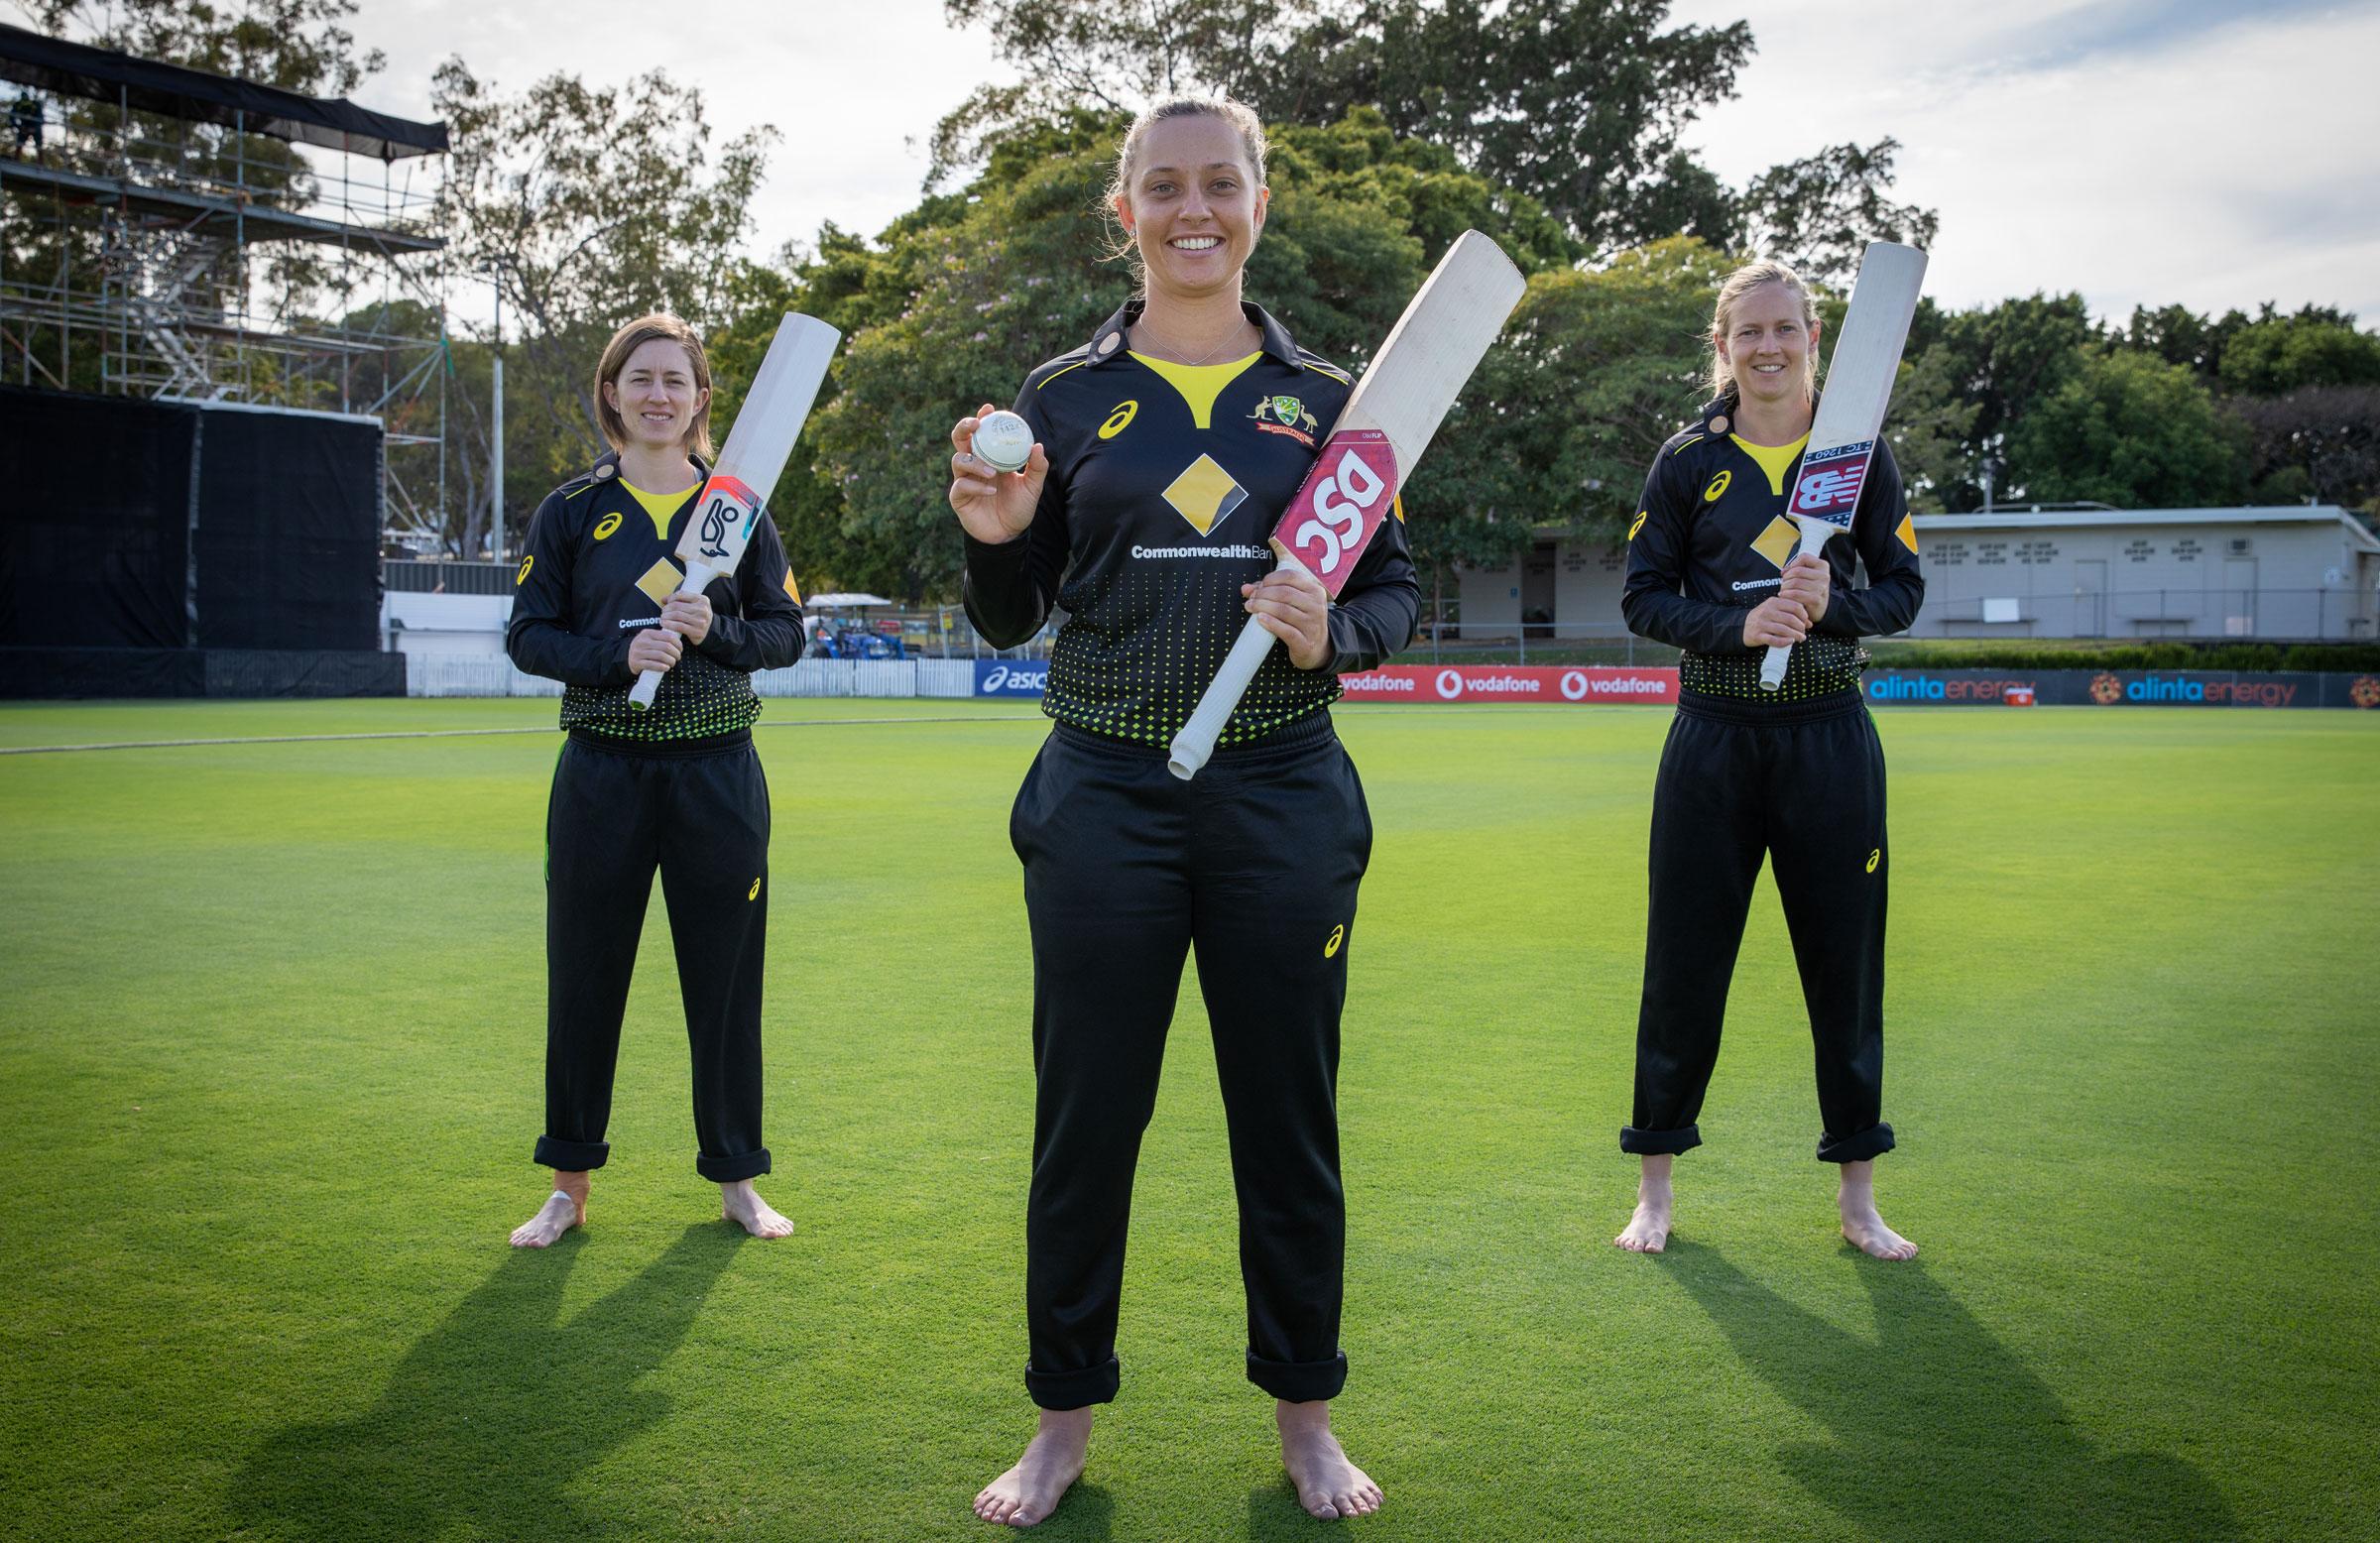 Australia will form a Barefoot Circle on Allan Border Field on Saturday // cricket.com.au